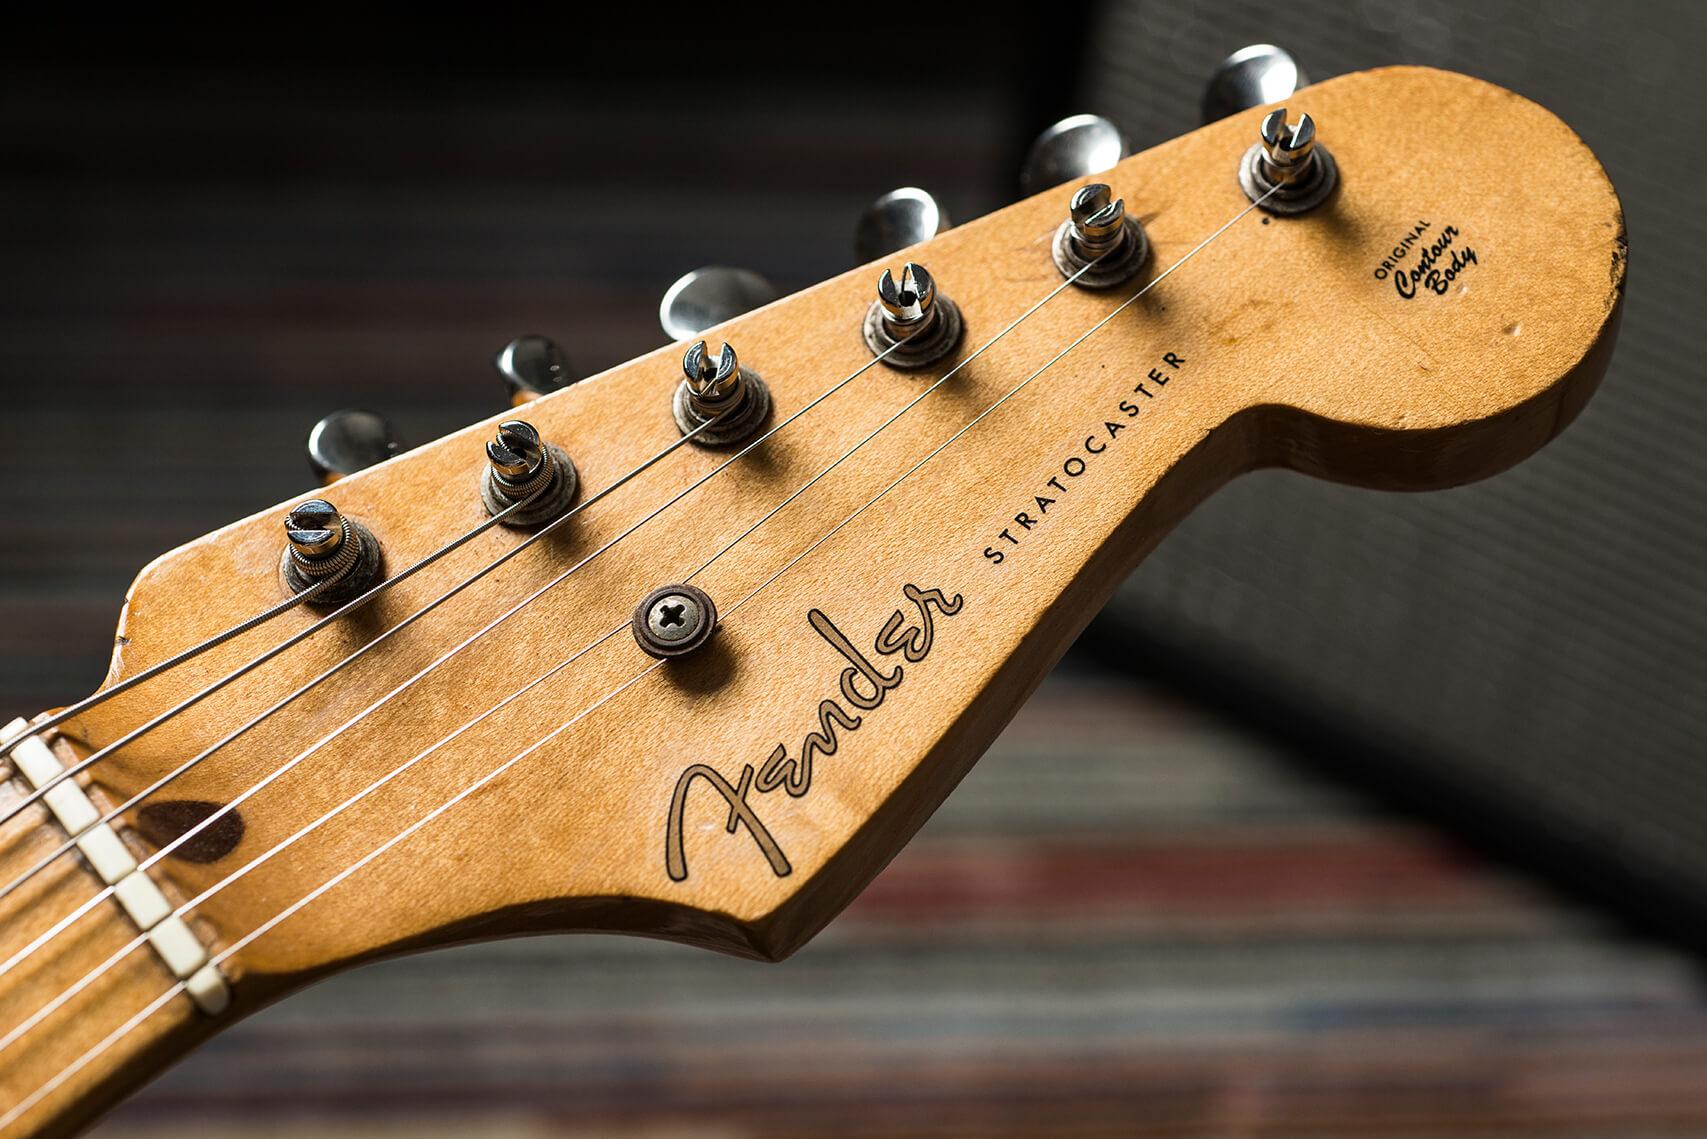 Jeff Garlin's 1955 Hardtail Sunburst Stratocaster Headstock